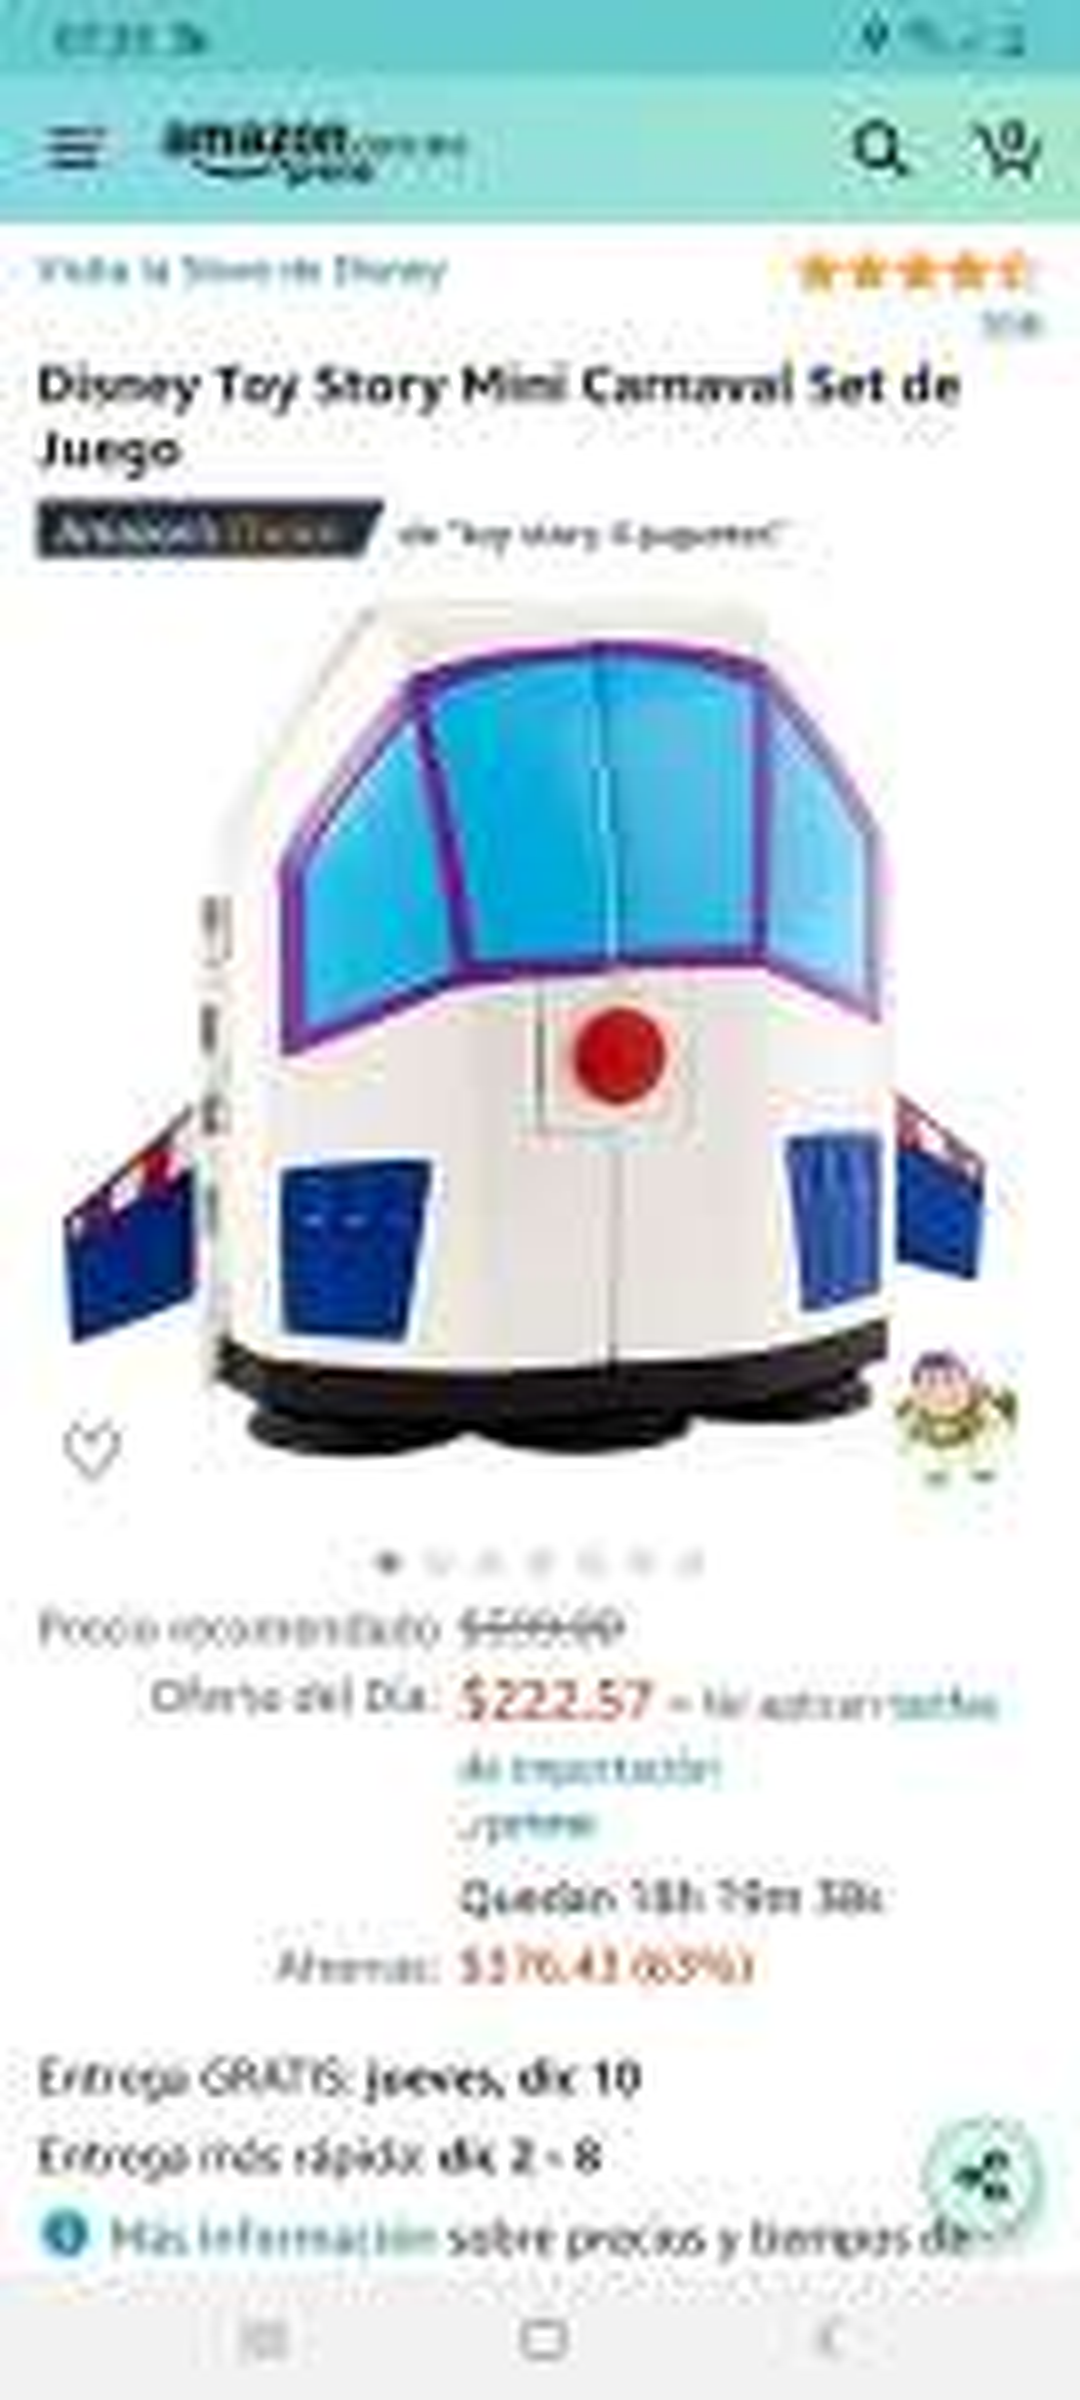 Amazon: Disney toy story Mini carnaval